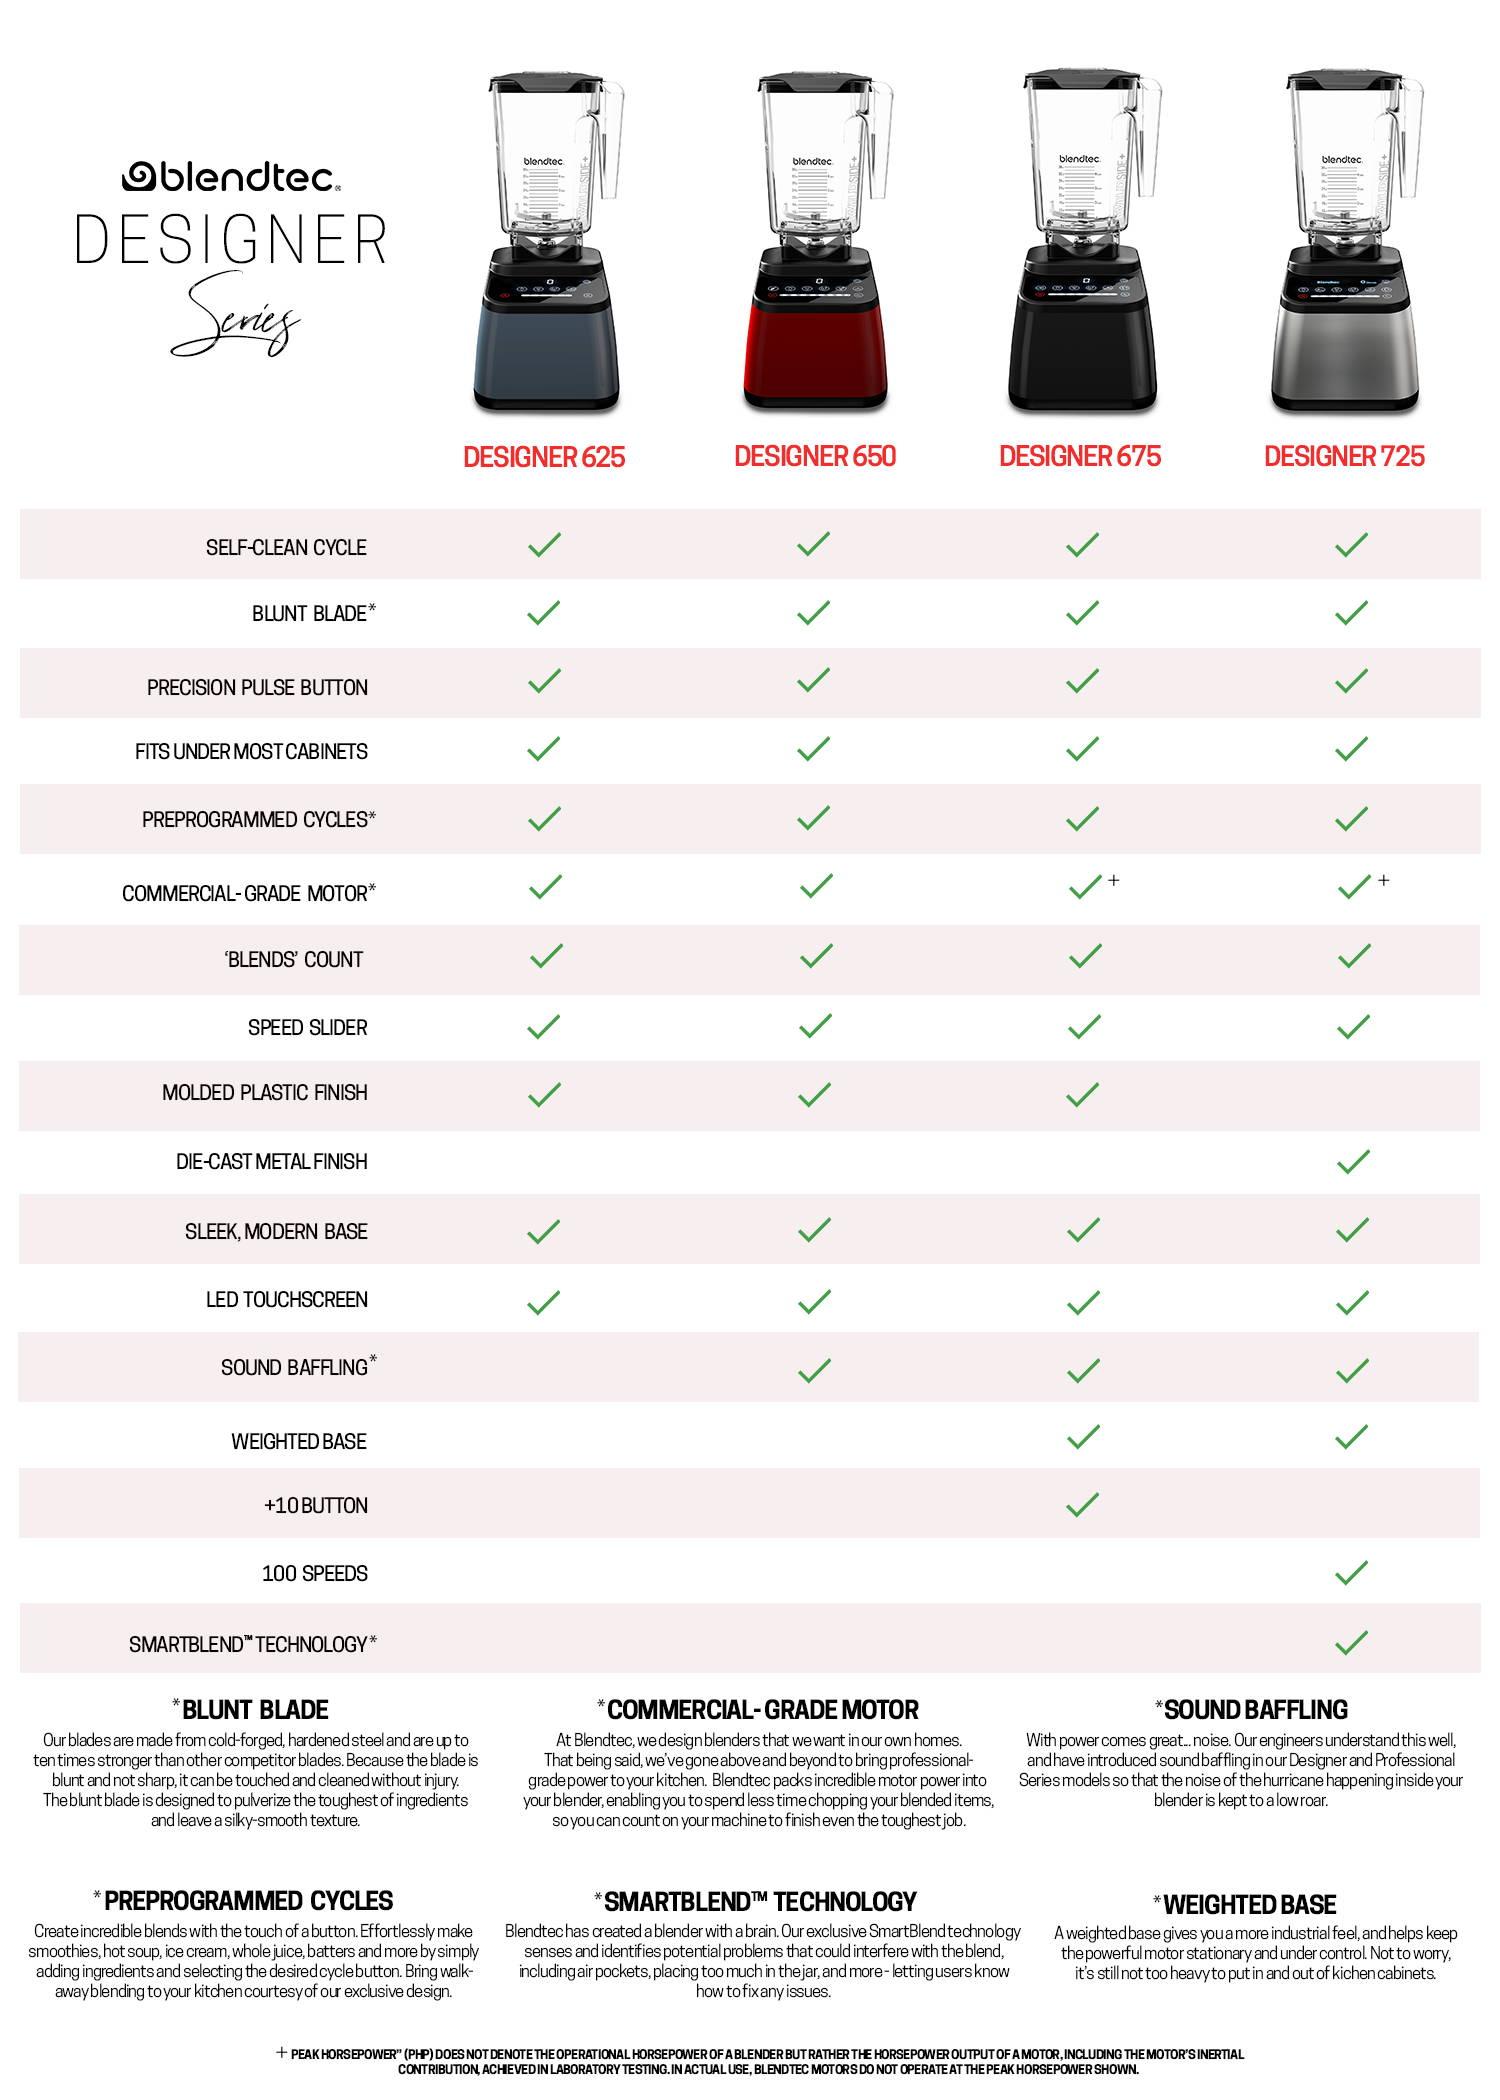 Designer Series Comparison Blendtec